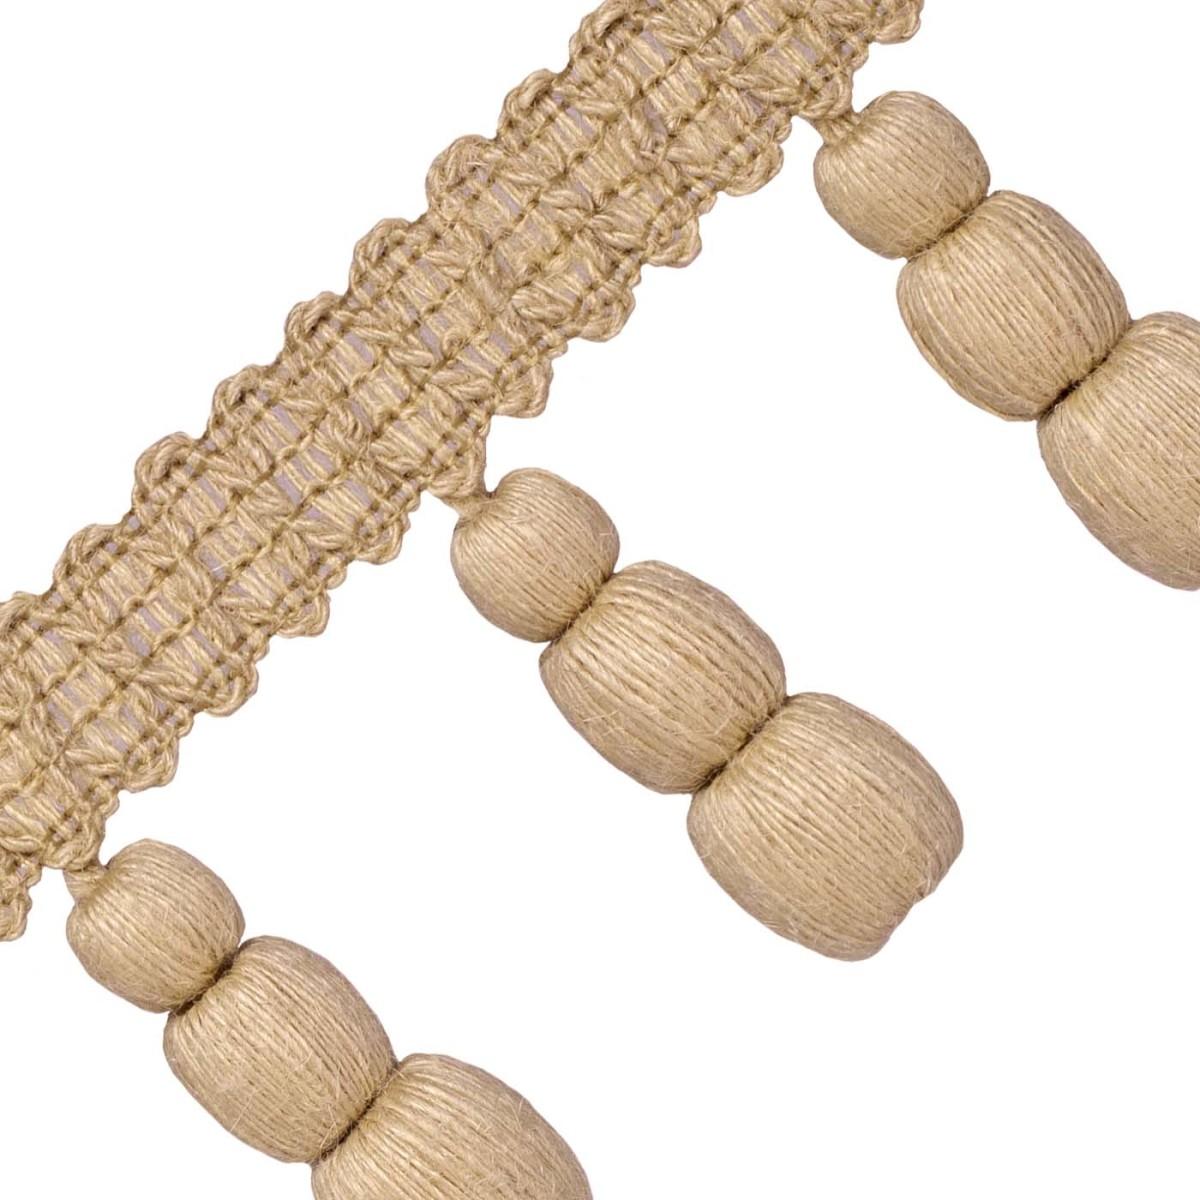 1yd  LEE JOFA Quincy Ice Hand Crafted Tassel Ball Fringe Passementerie Trim BTY